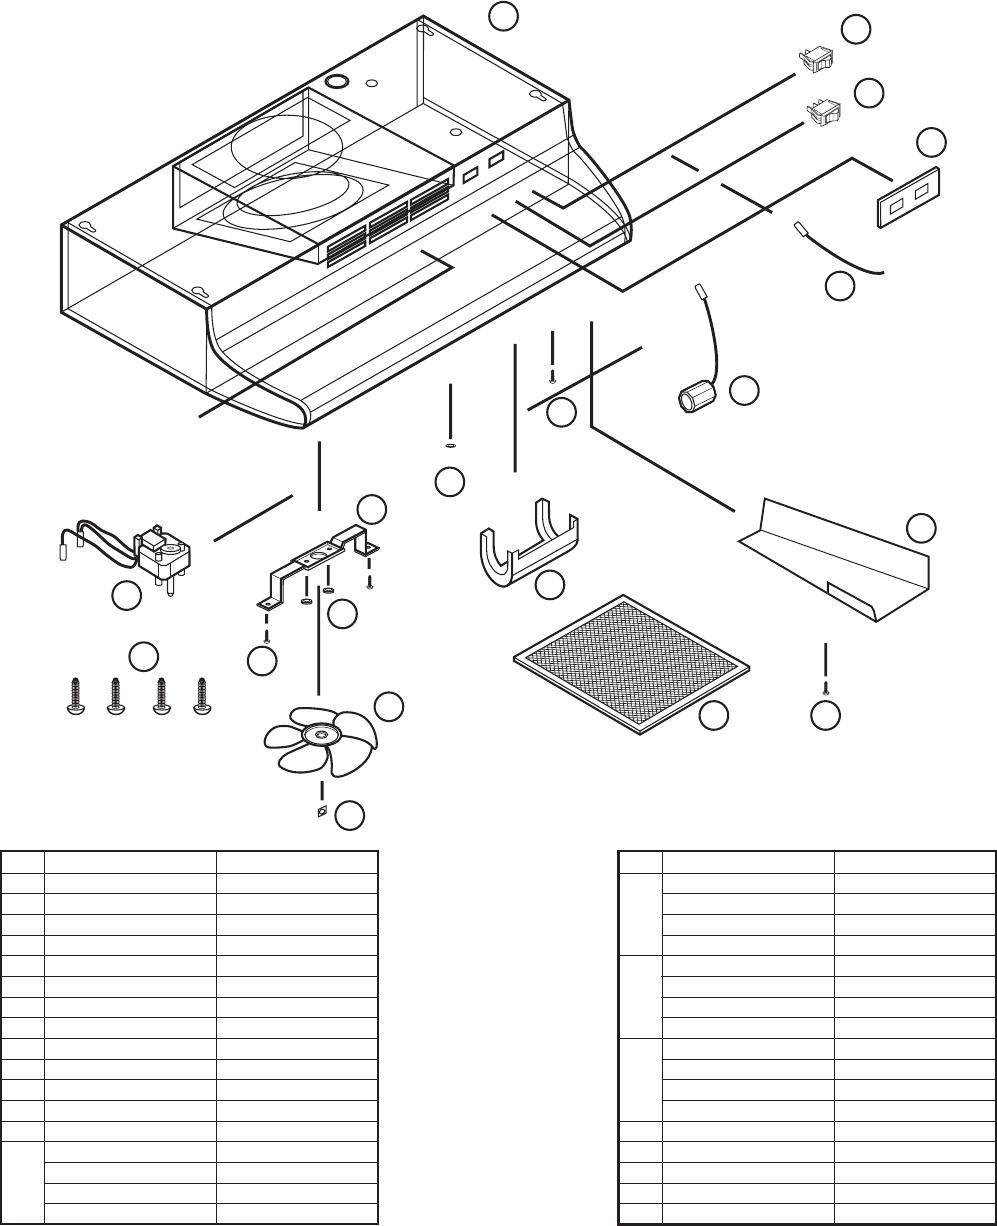 Air King RF55 REPLACEMENT PARTS DIAGRAM